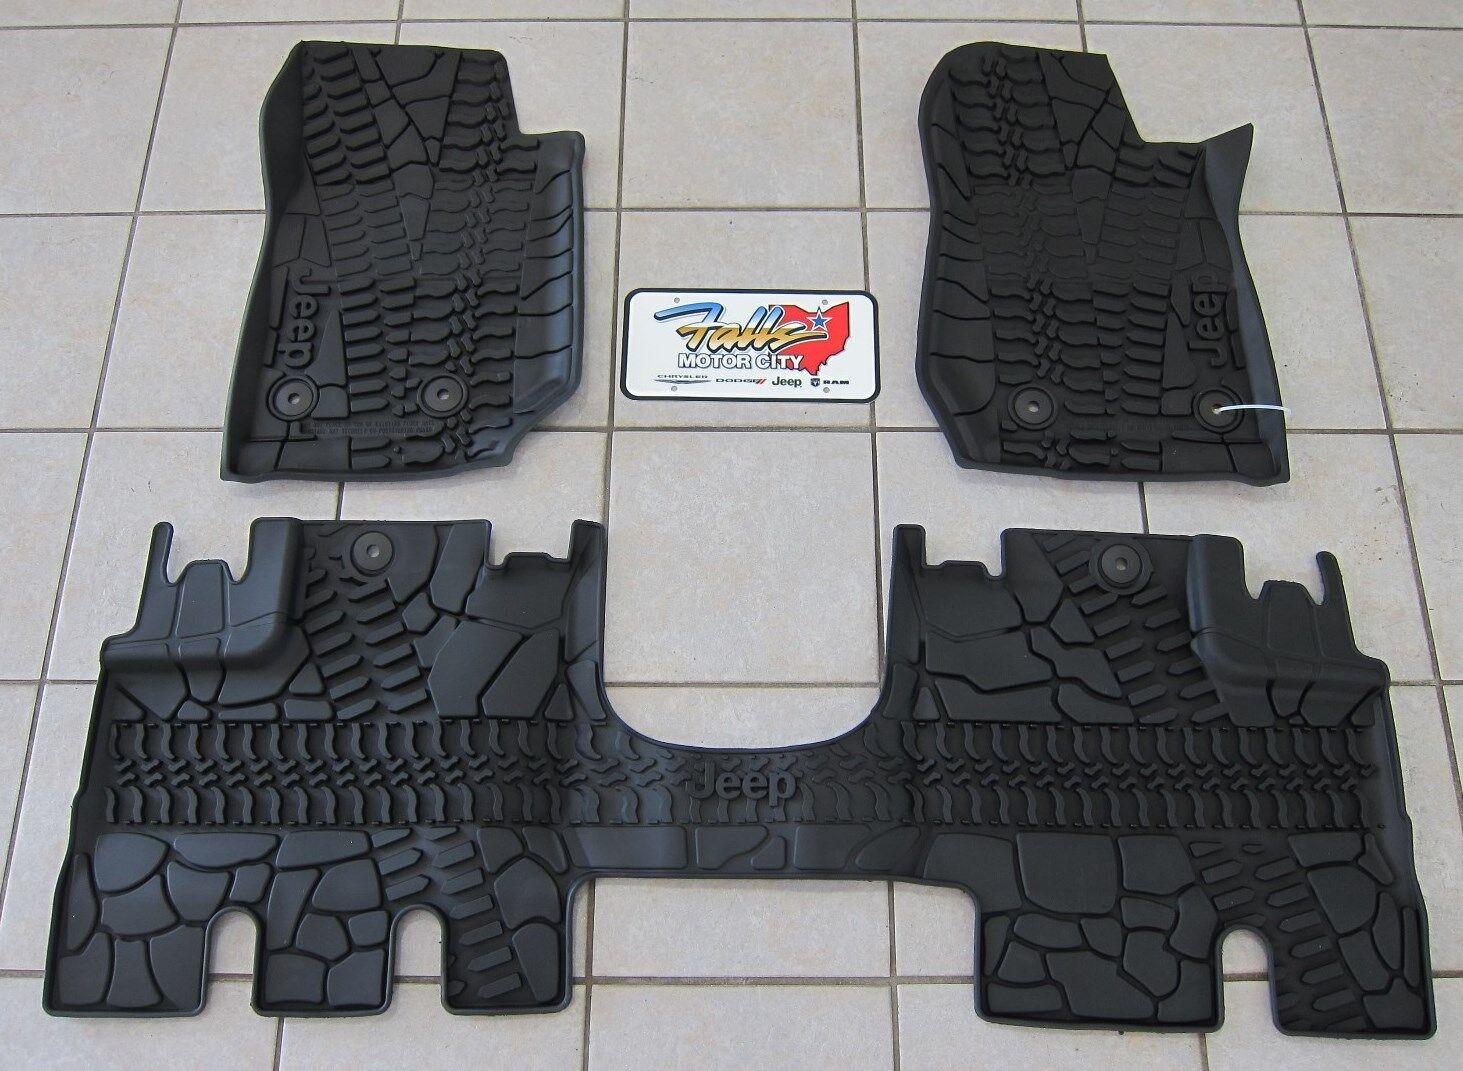 2014 18 Jeep Wrangler JK Unlimited RHD All Weather Rubber Slush Floor Mats  Mopar